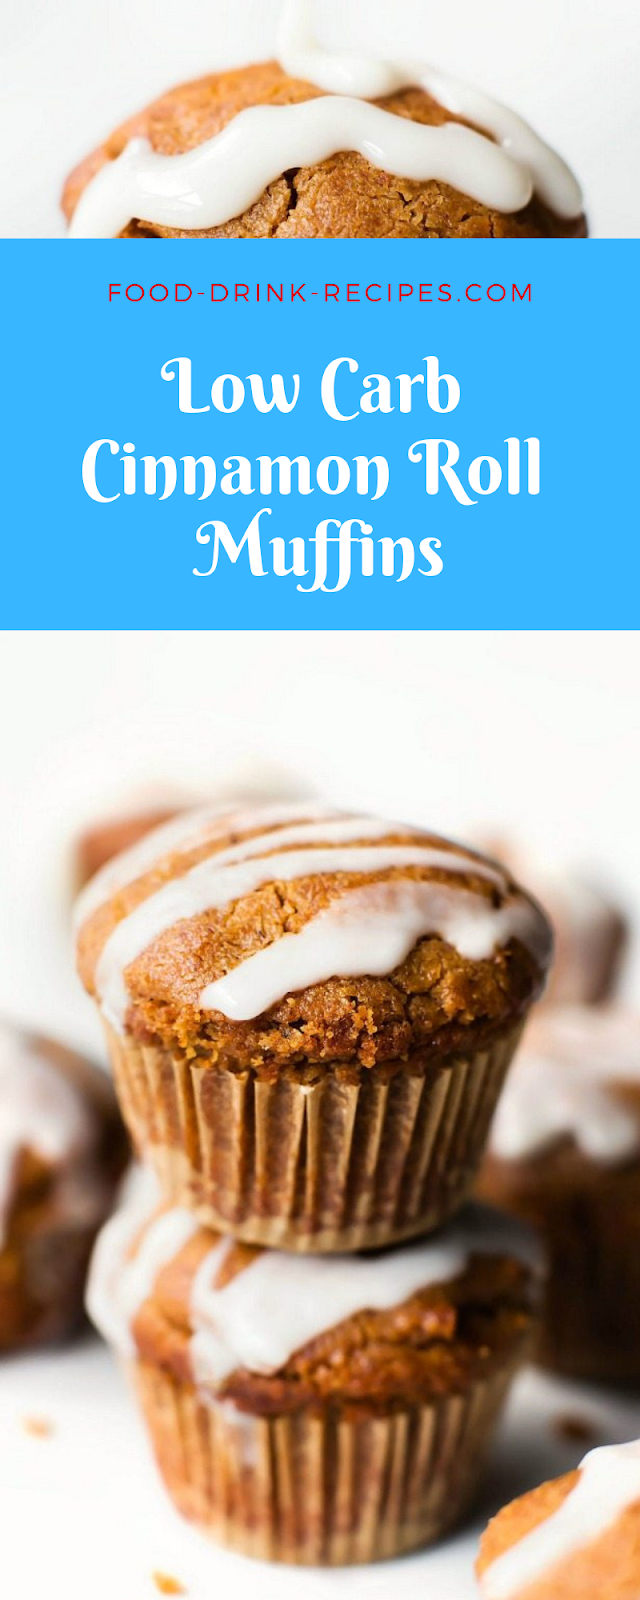 Low Carb Cinnamon Roll Muffins - food-drink-recipes.com